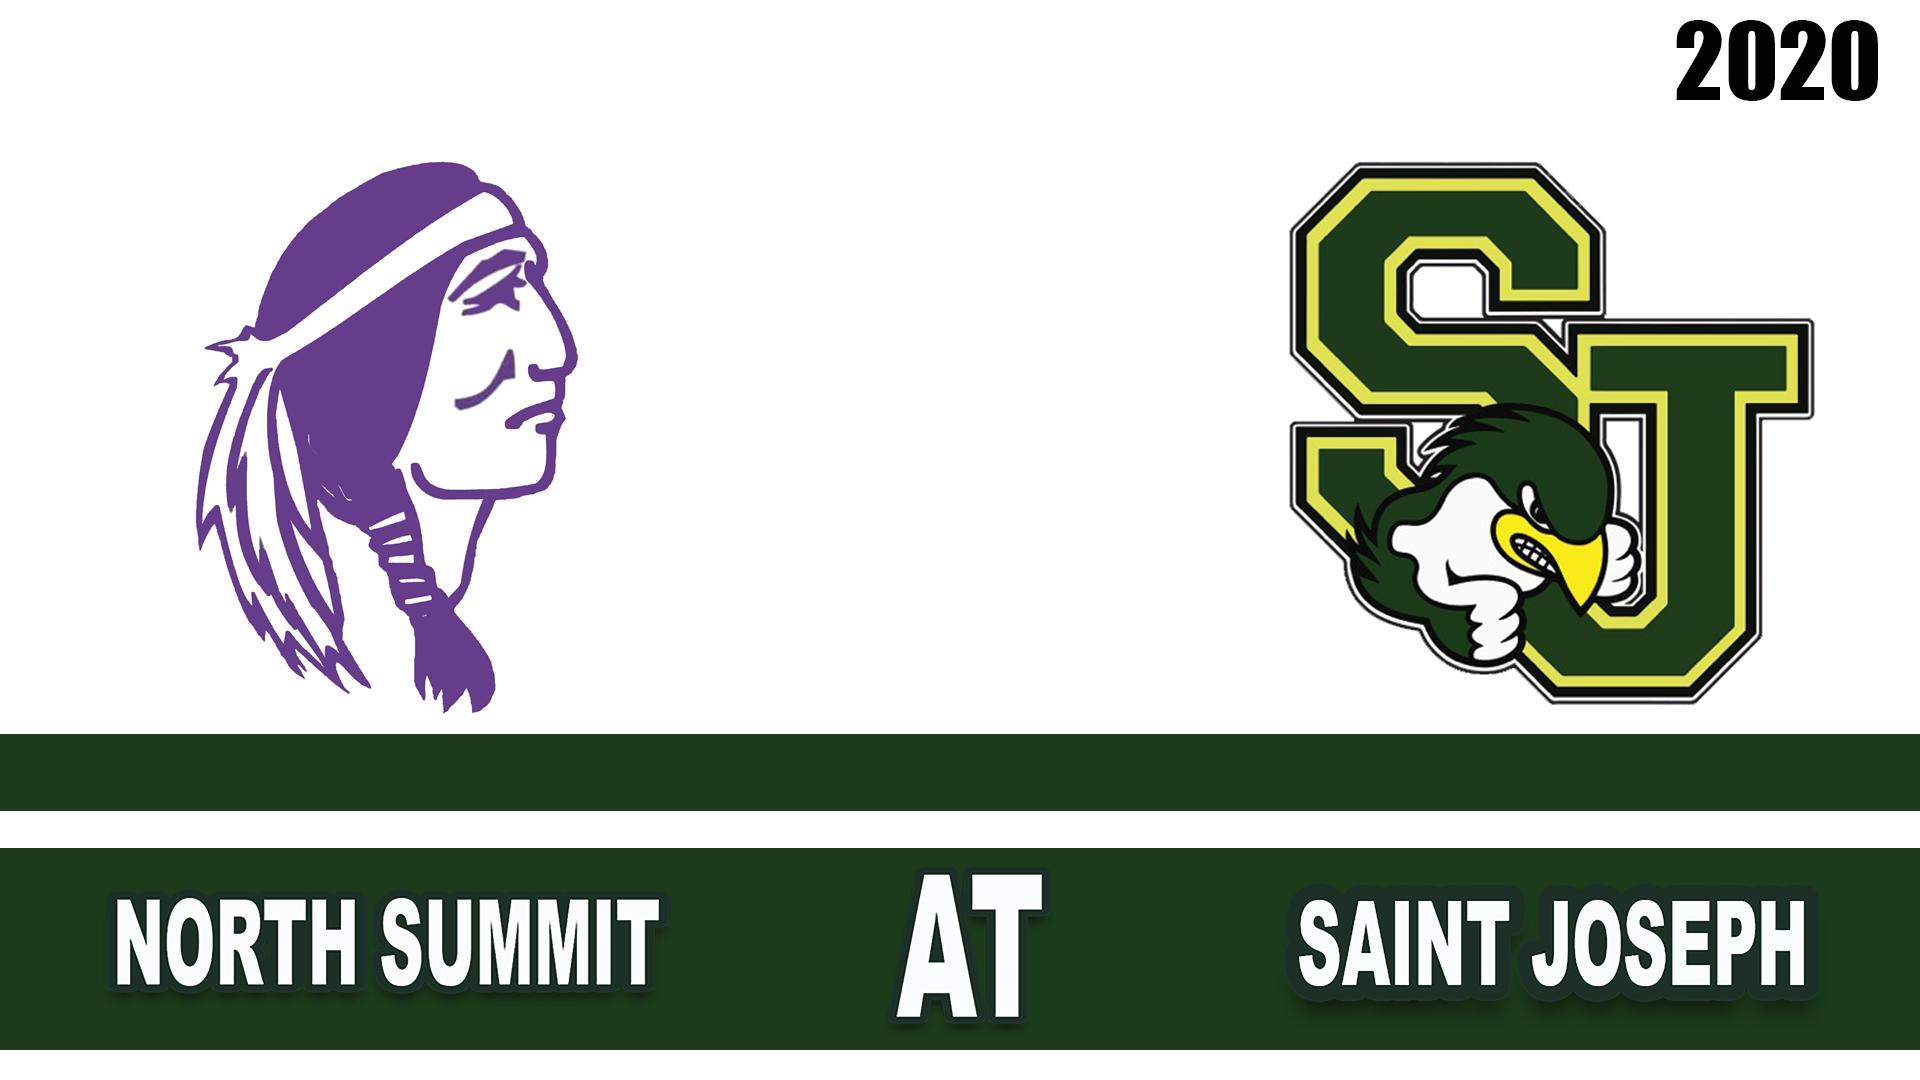 North Summit at Saint Joseph